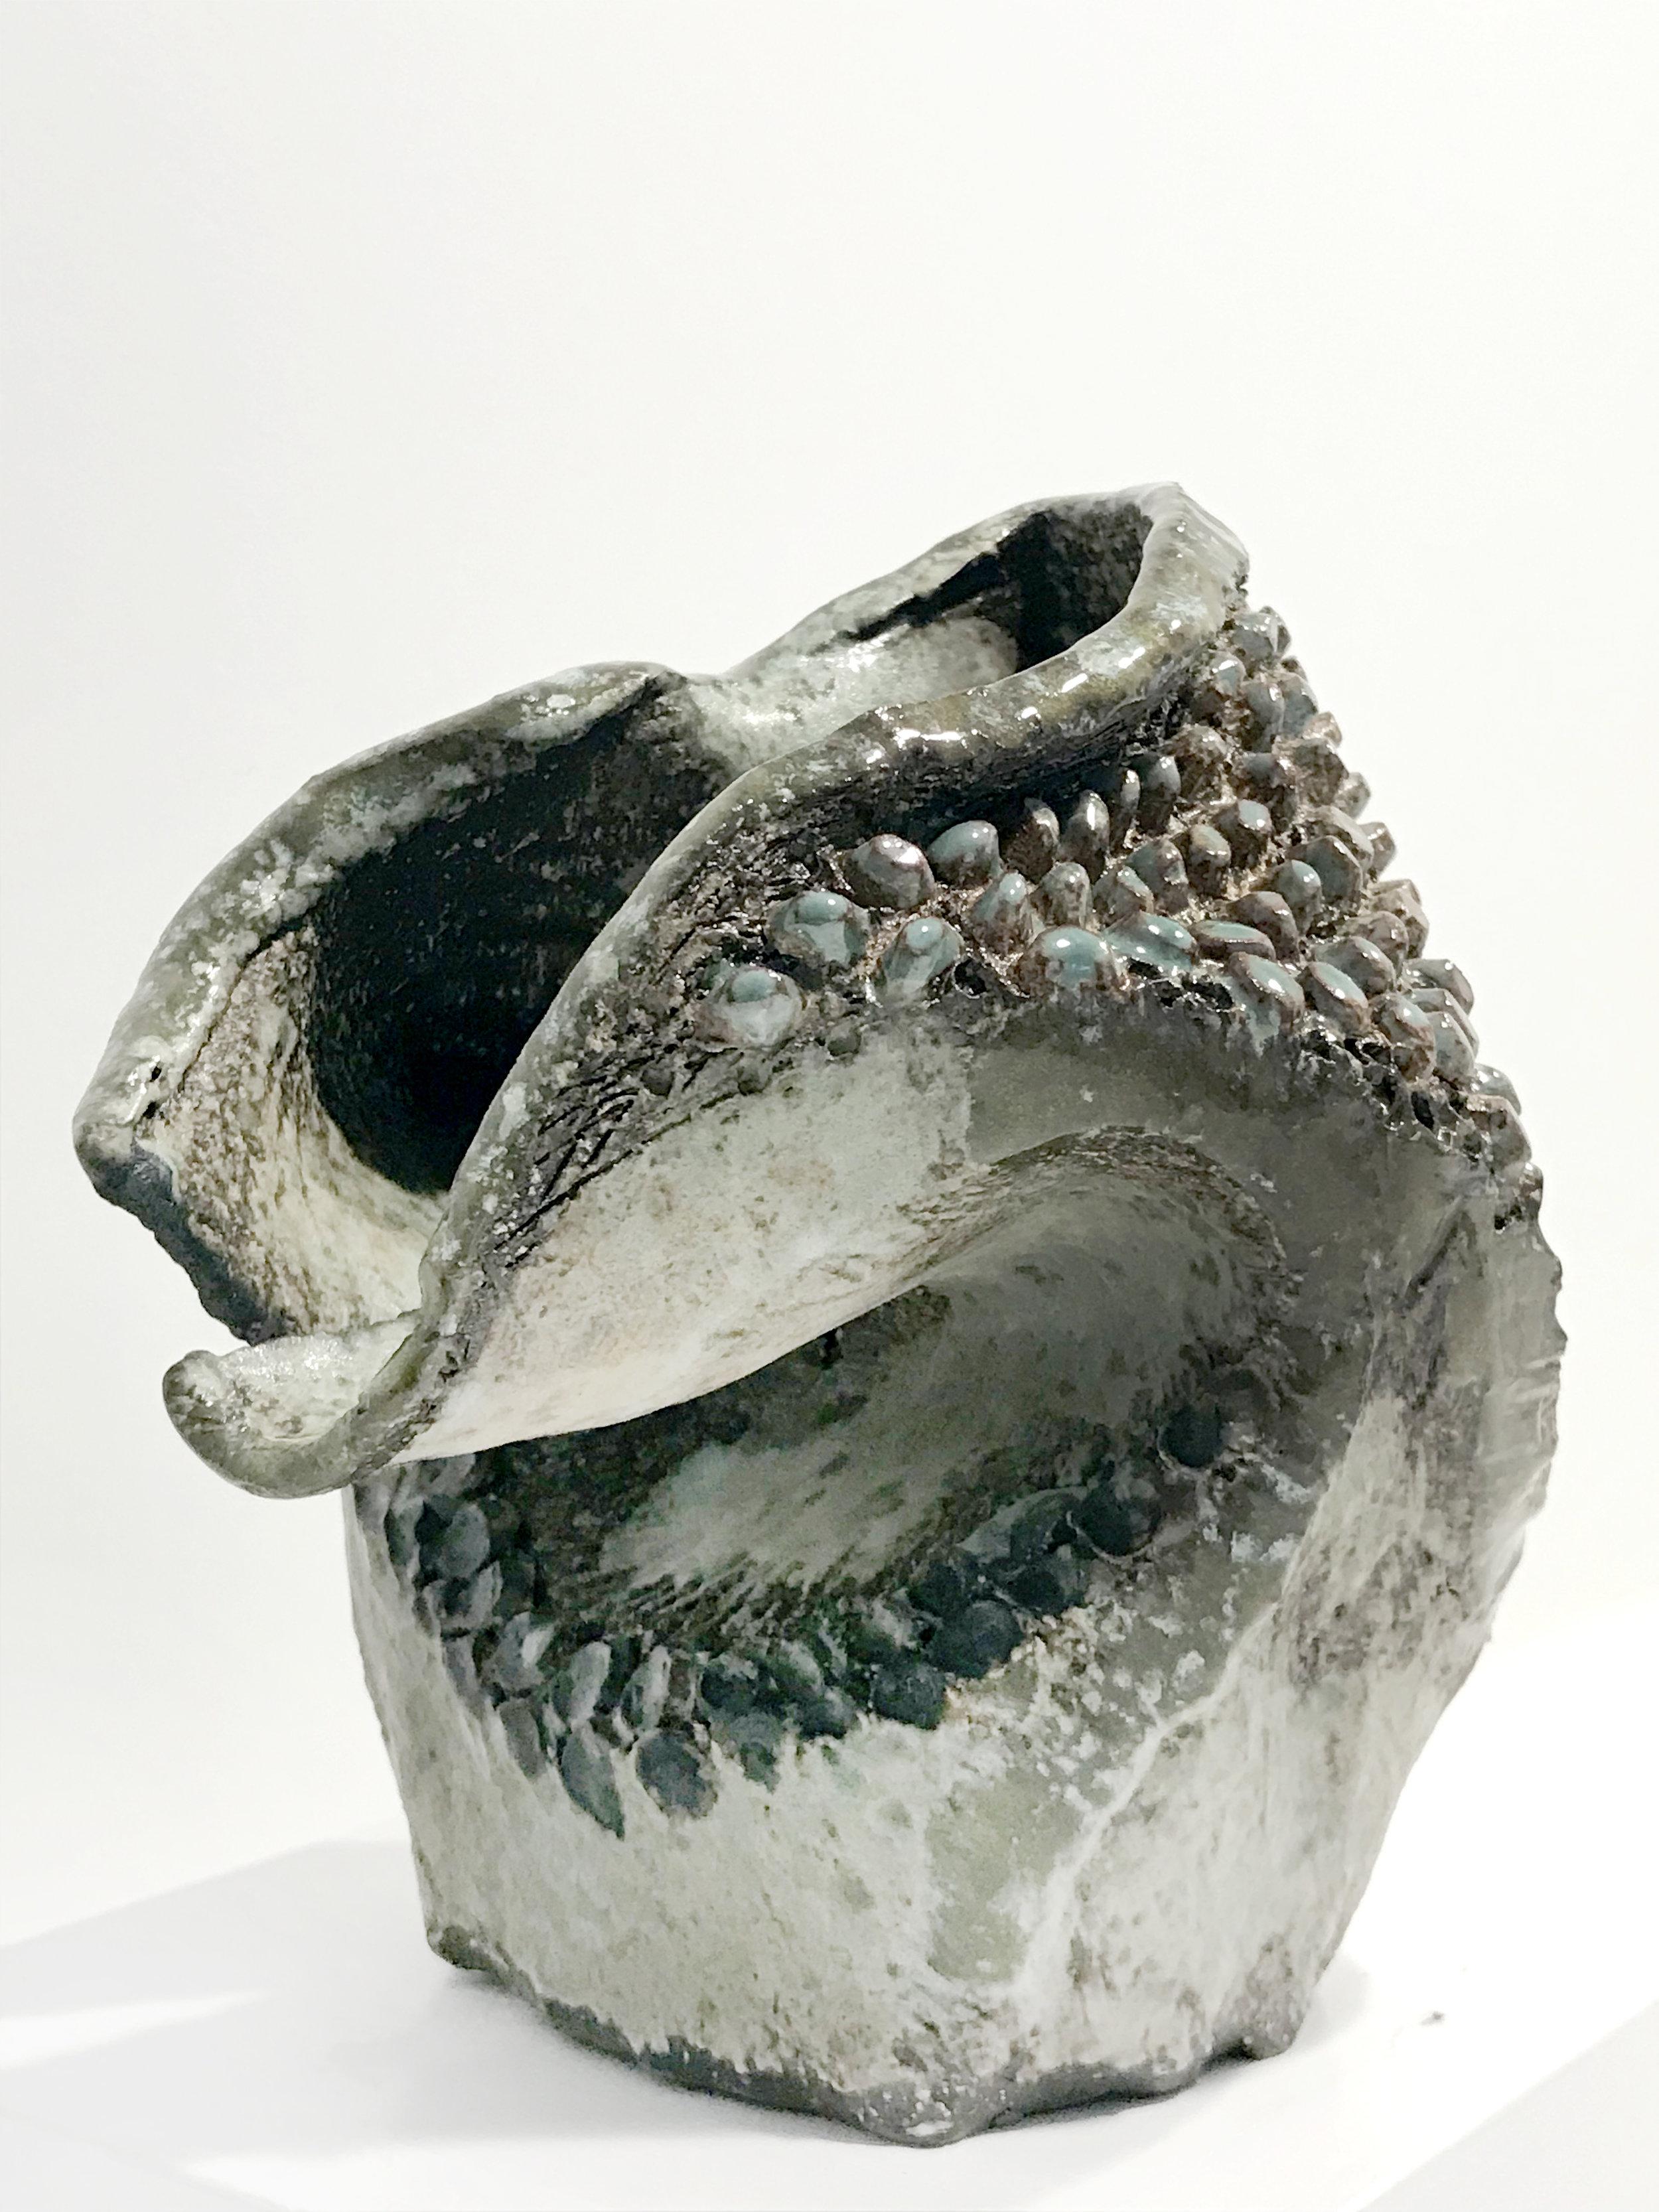 - Dena ZemskySculptural Vessel2018Glazed stoneware5 3/4 x 5 1/2 x 5 inches